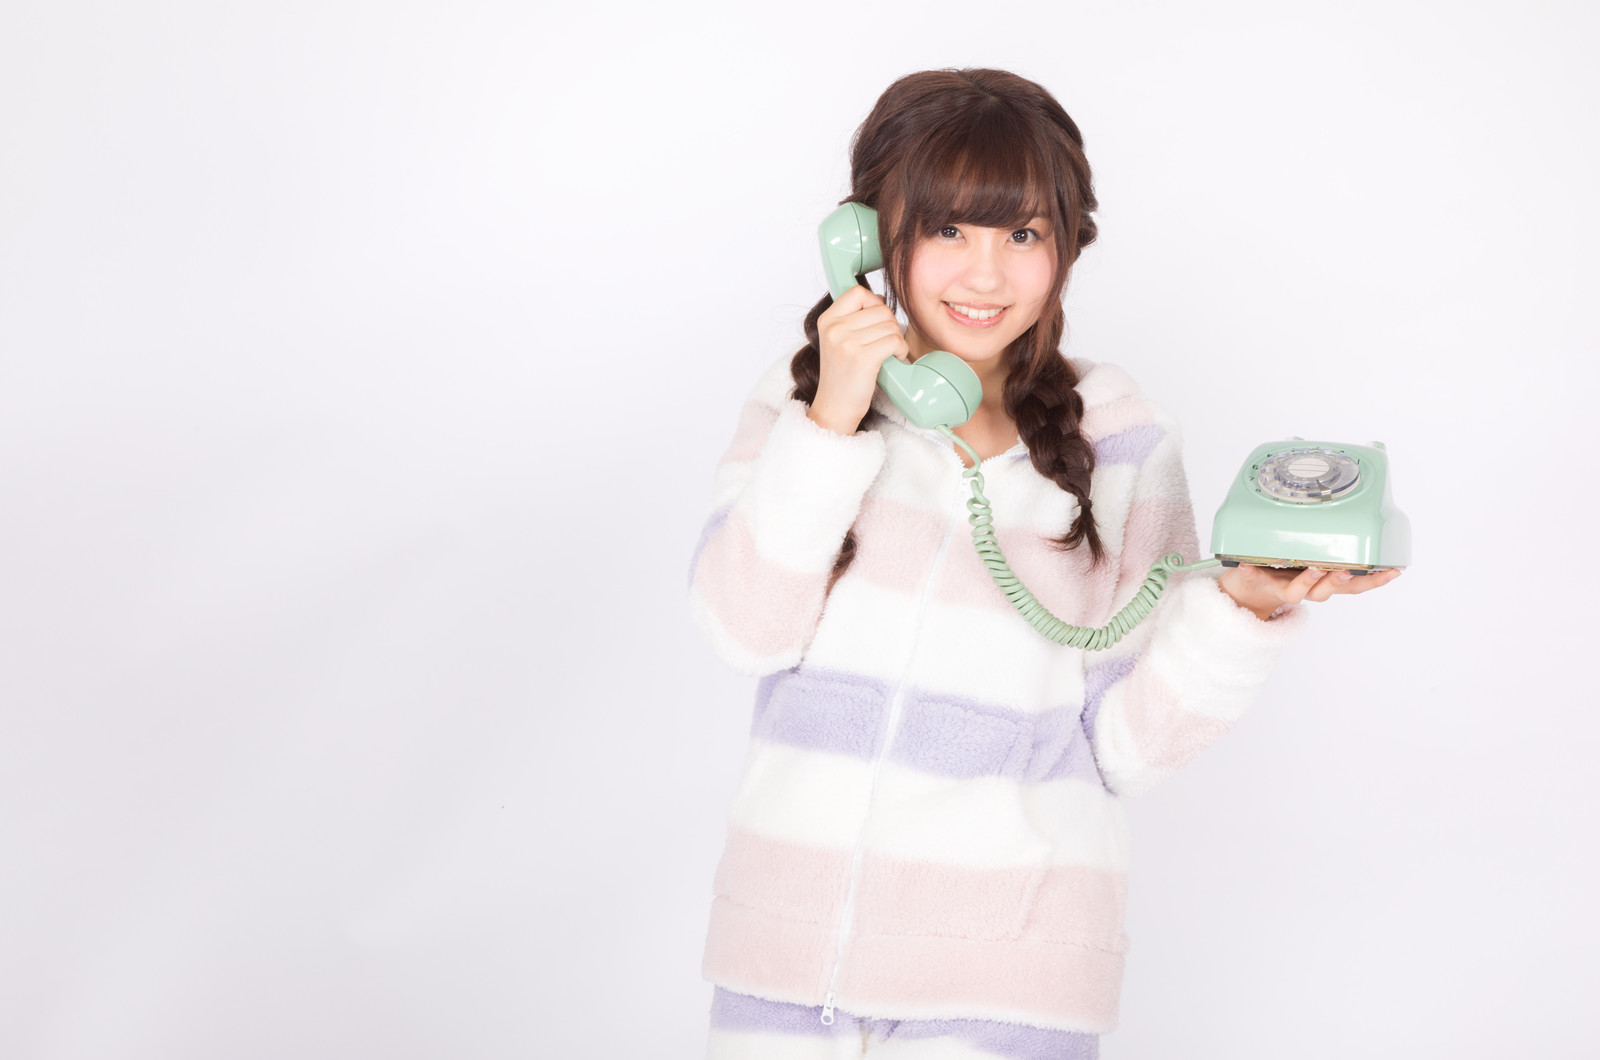 https://www.pakutaso.com/shared/img/thumb/kawamurayukaIMGL0344_TP_V.jpg